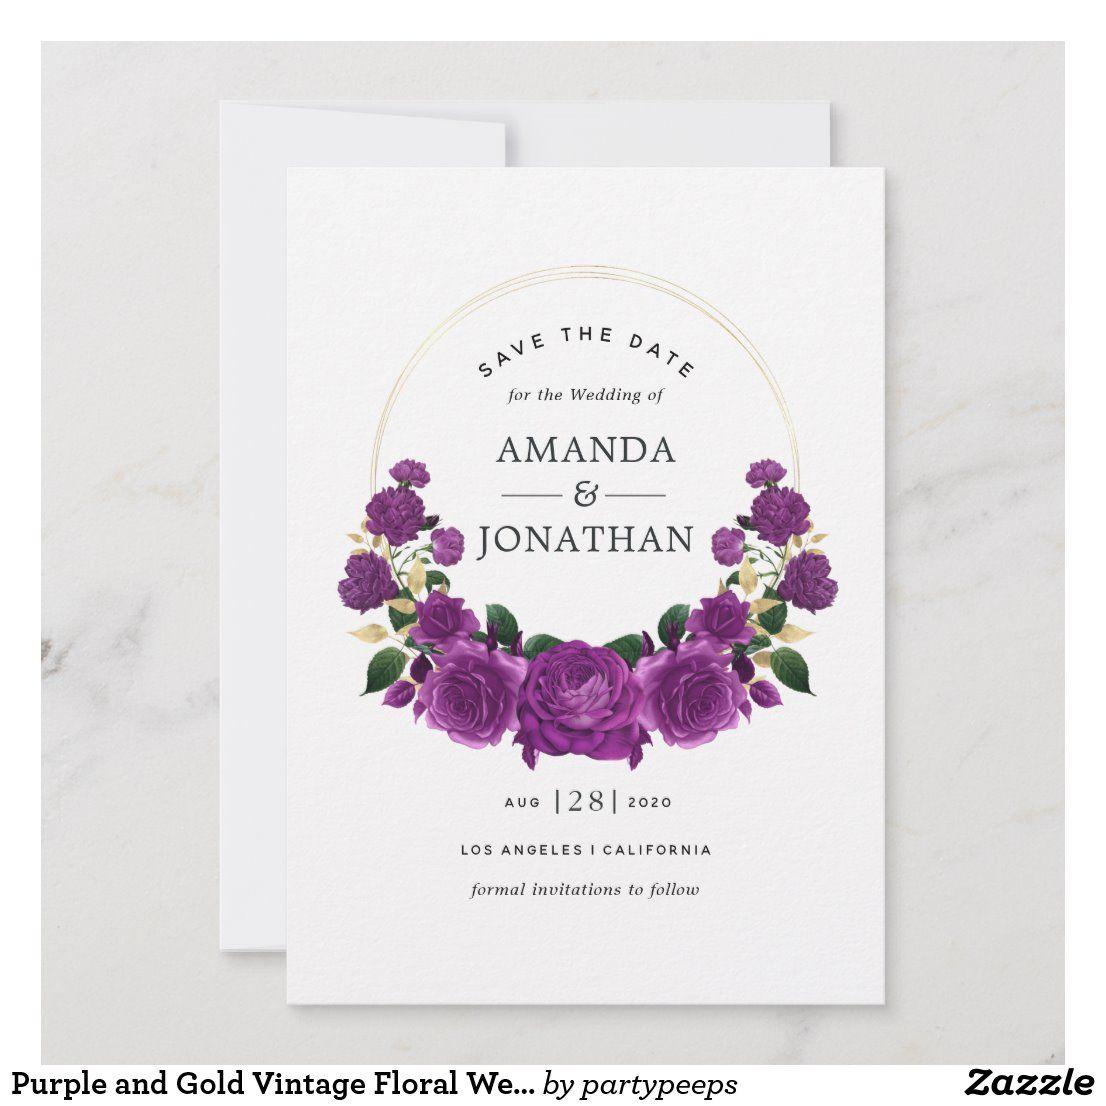 Purple And Gold Vintage Floral Wedding Save The Date Zazzle Com In 2020 Floral Wedding Save The Dates Wedding Saving Wedding Save The Dates